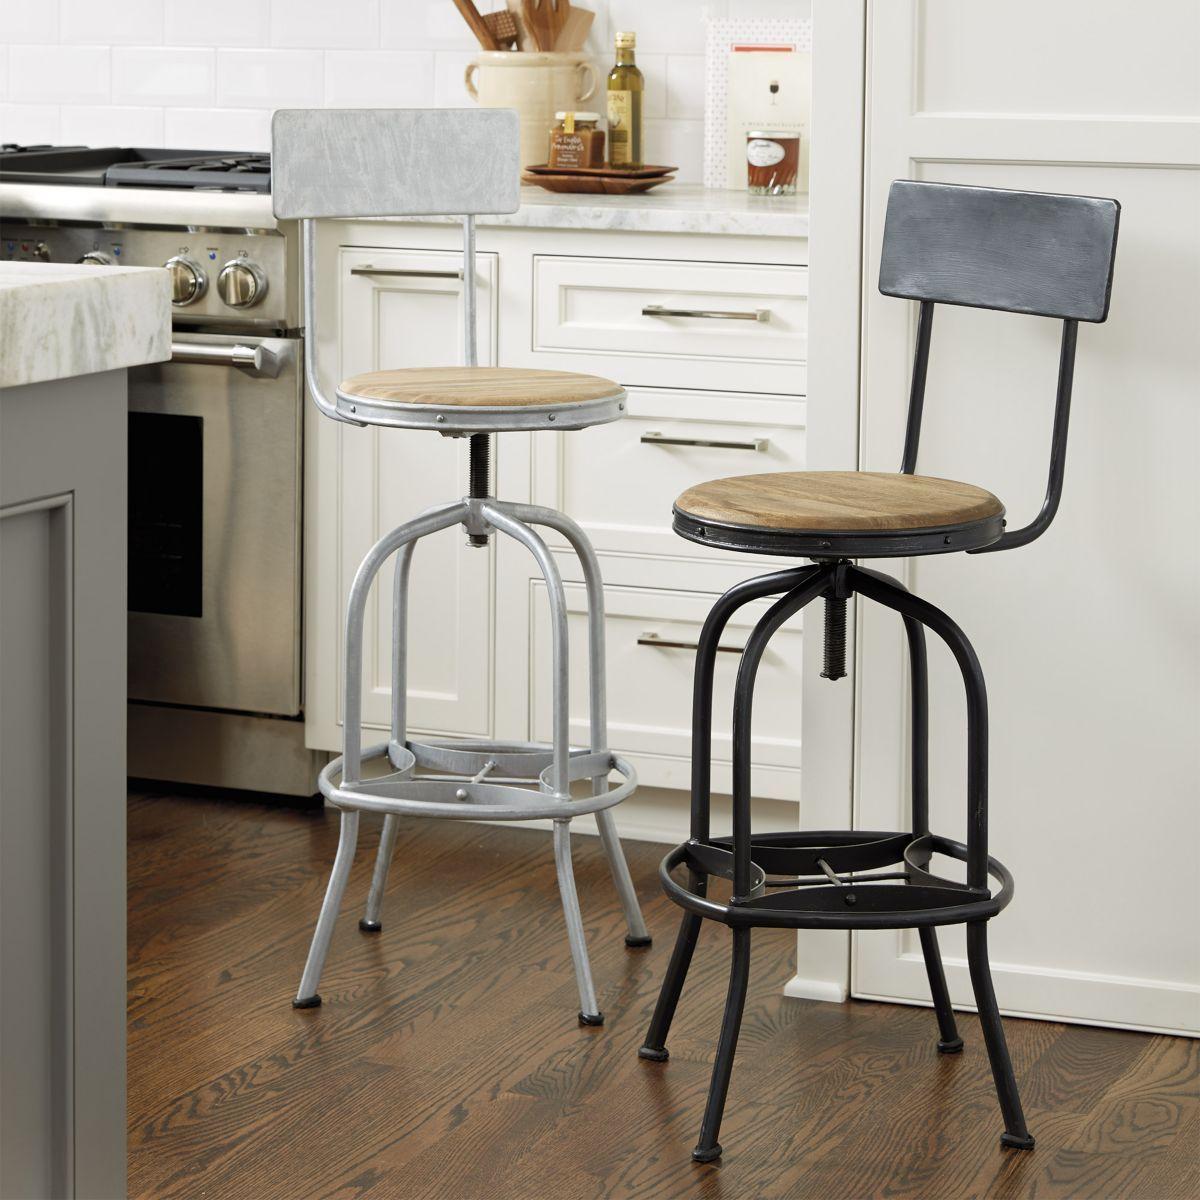 allen stool with back rest   kitchen   pinterest   stool, kitchen